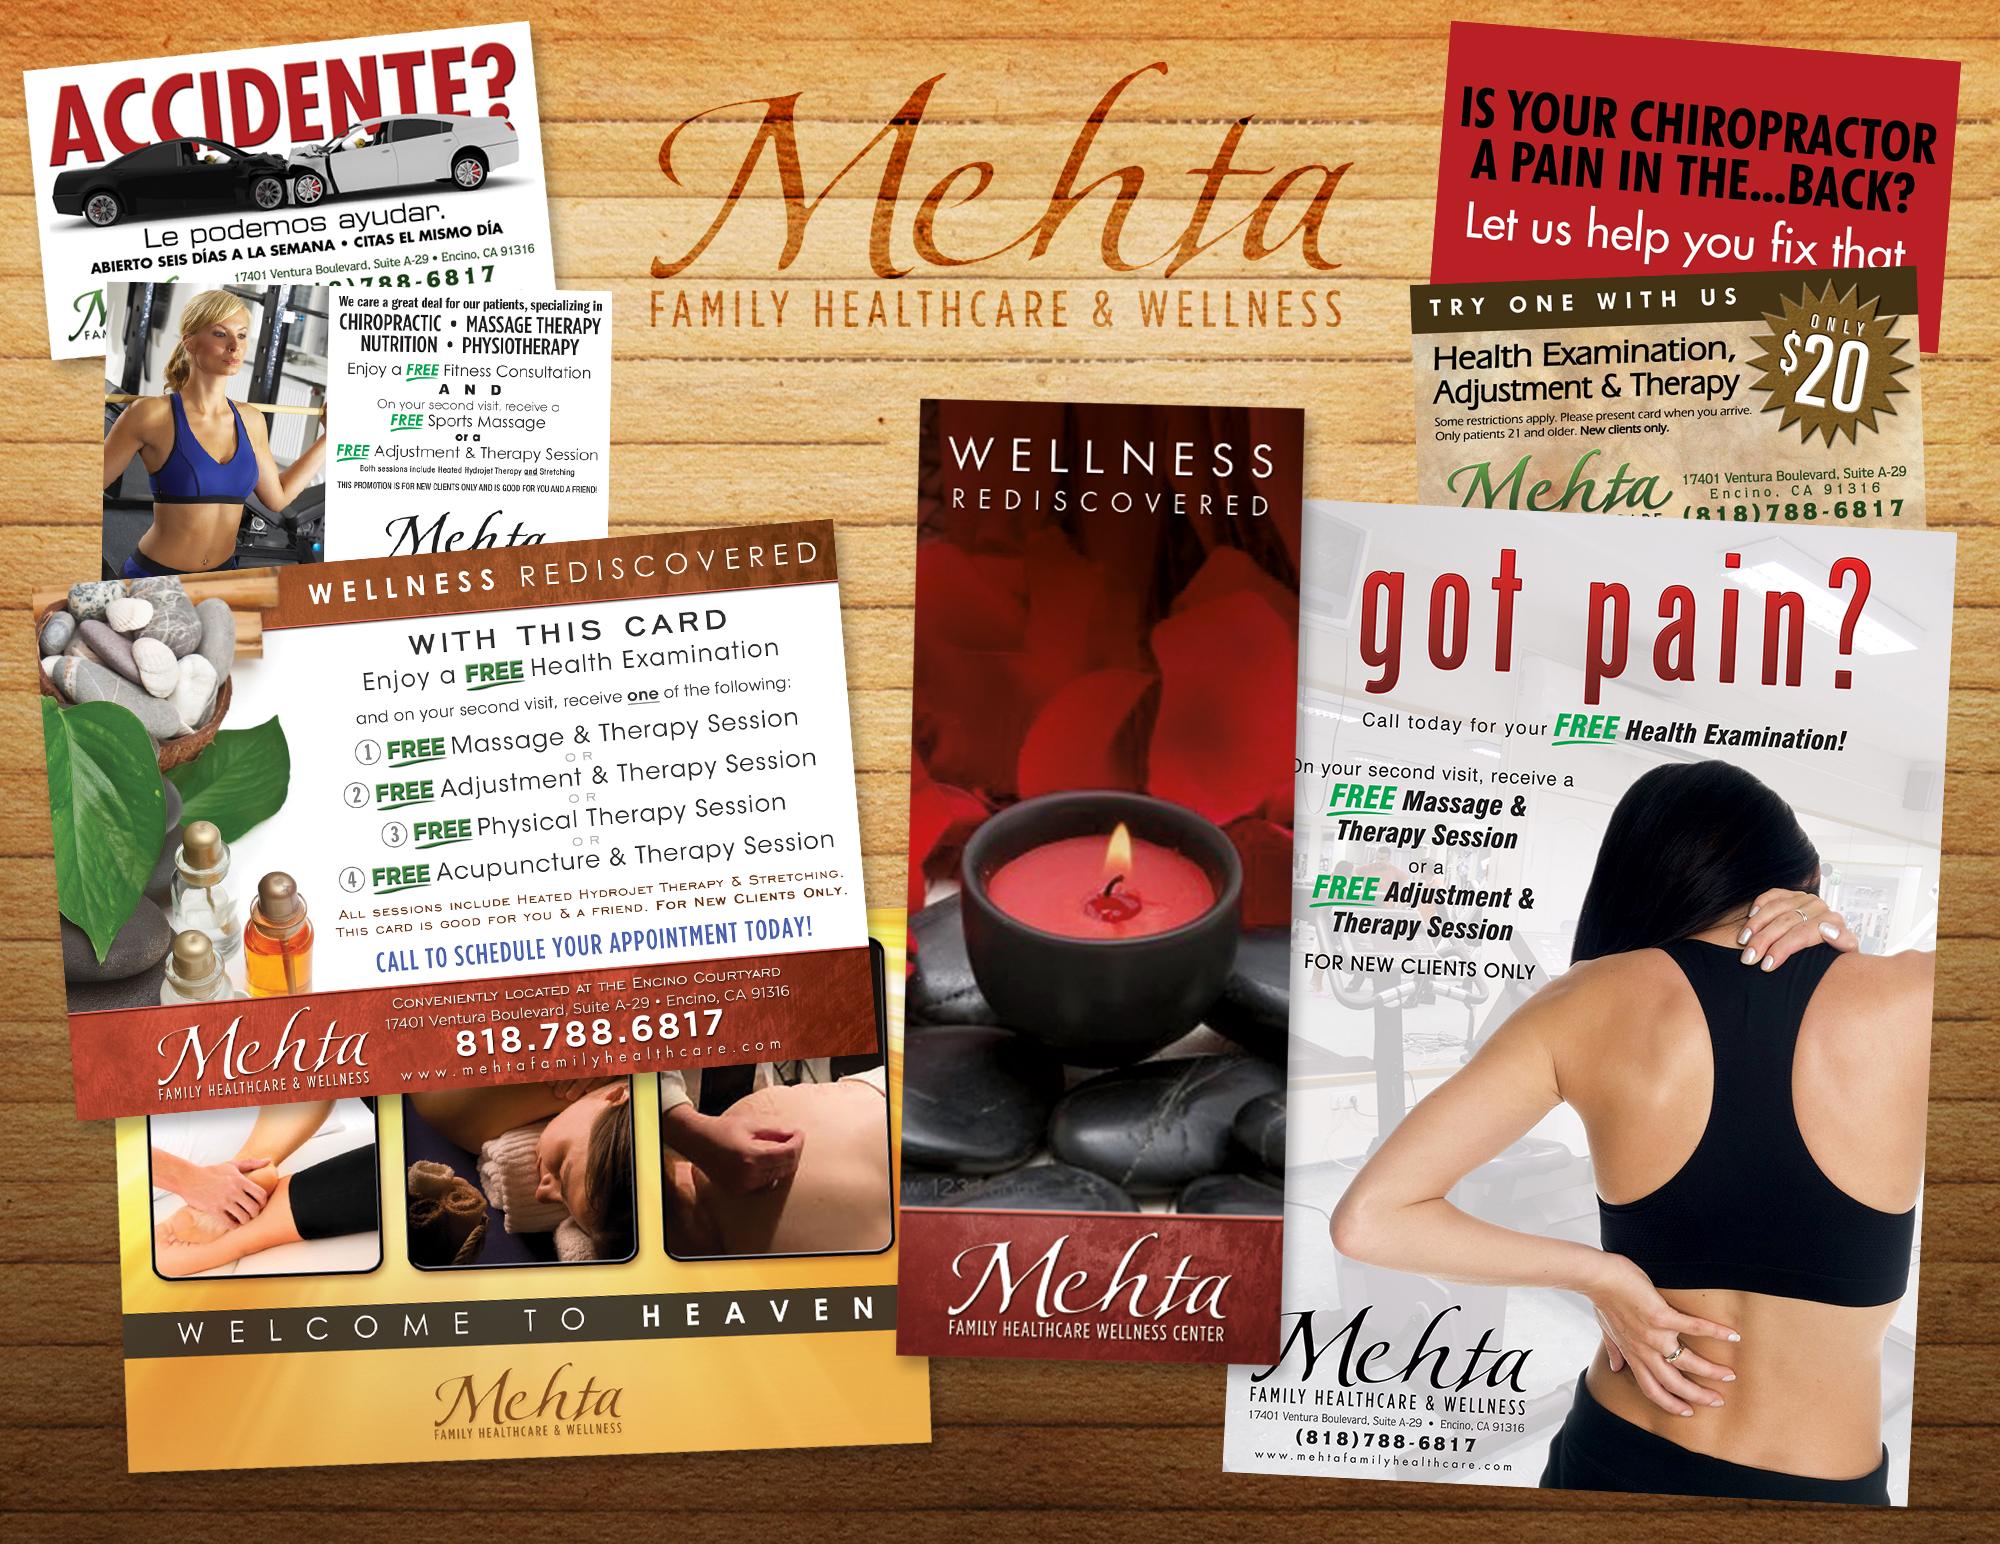 Mehta Family Healthcare & Wellness